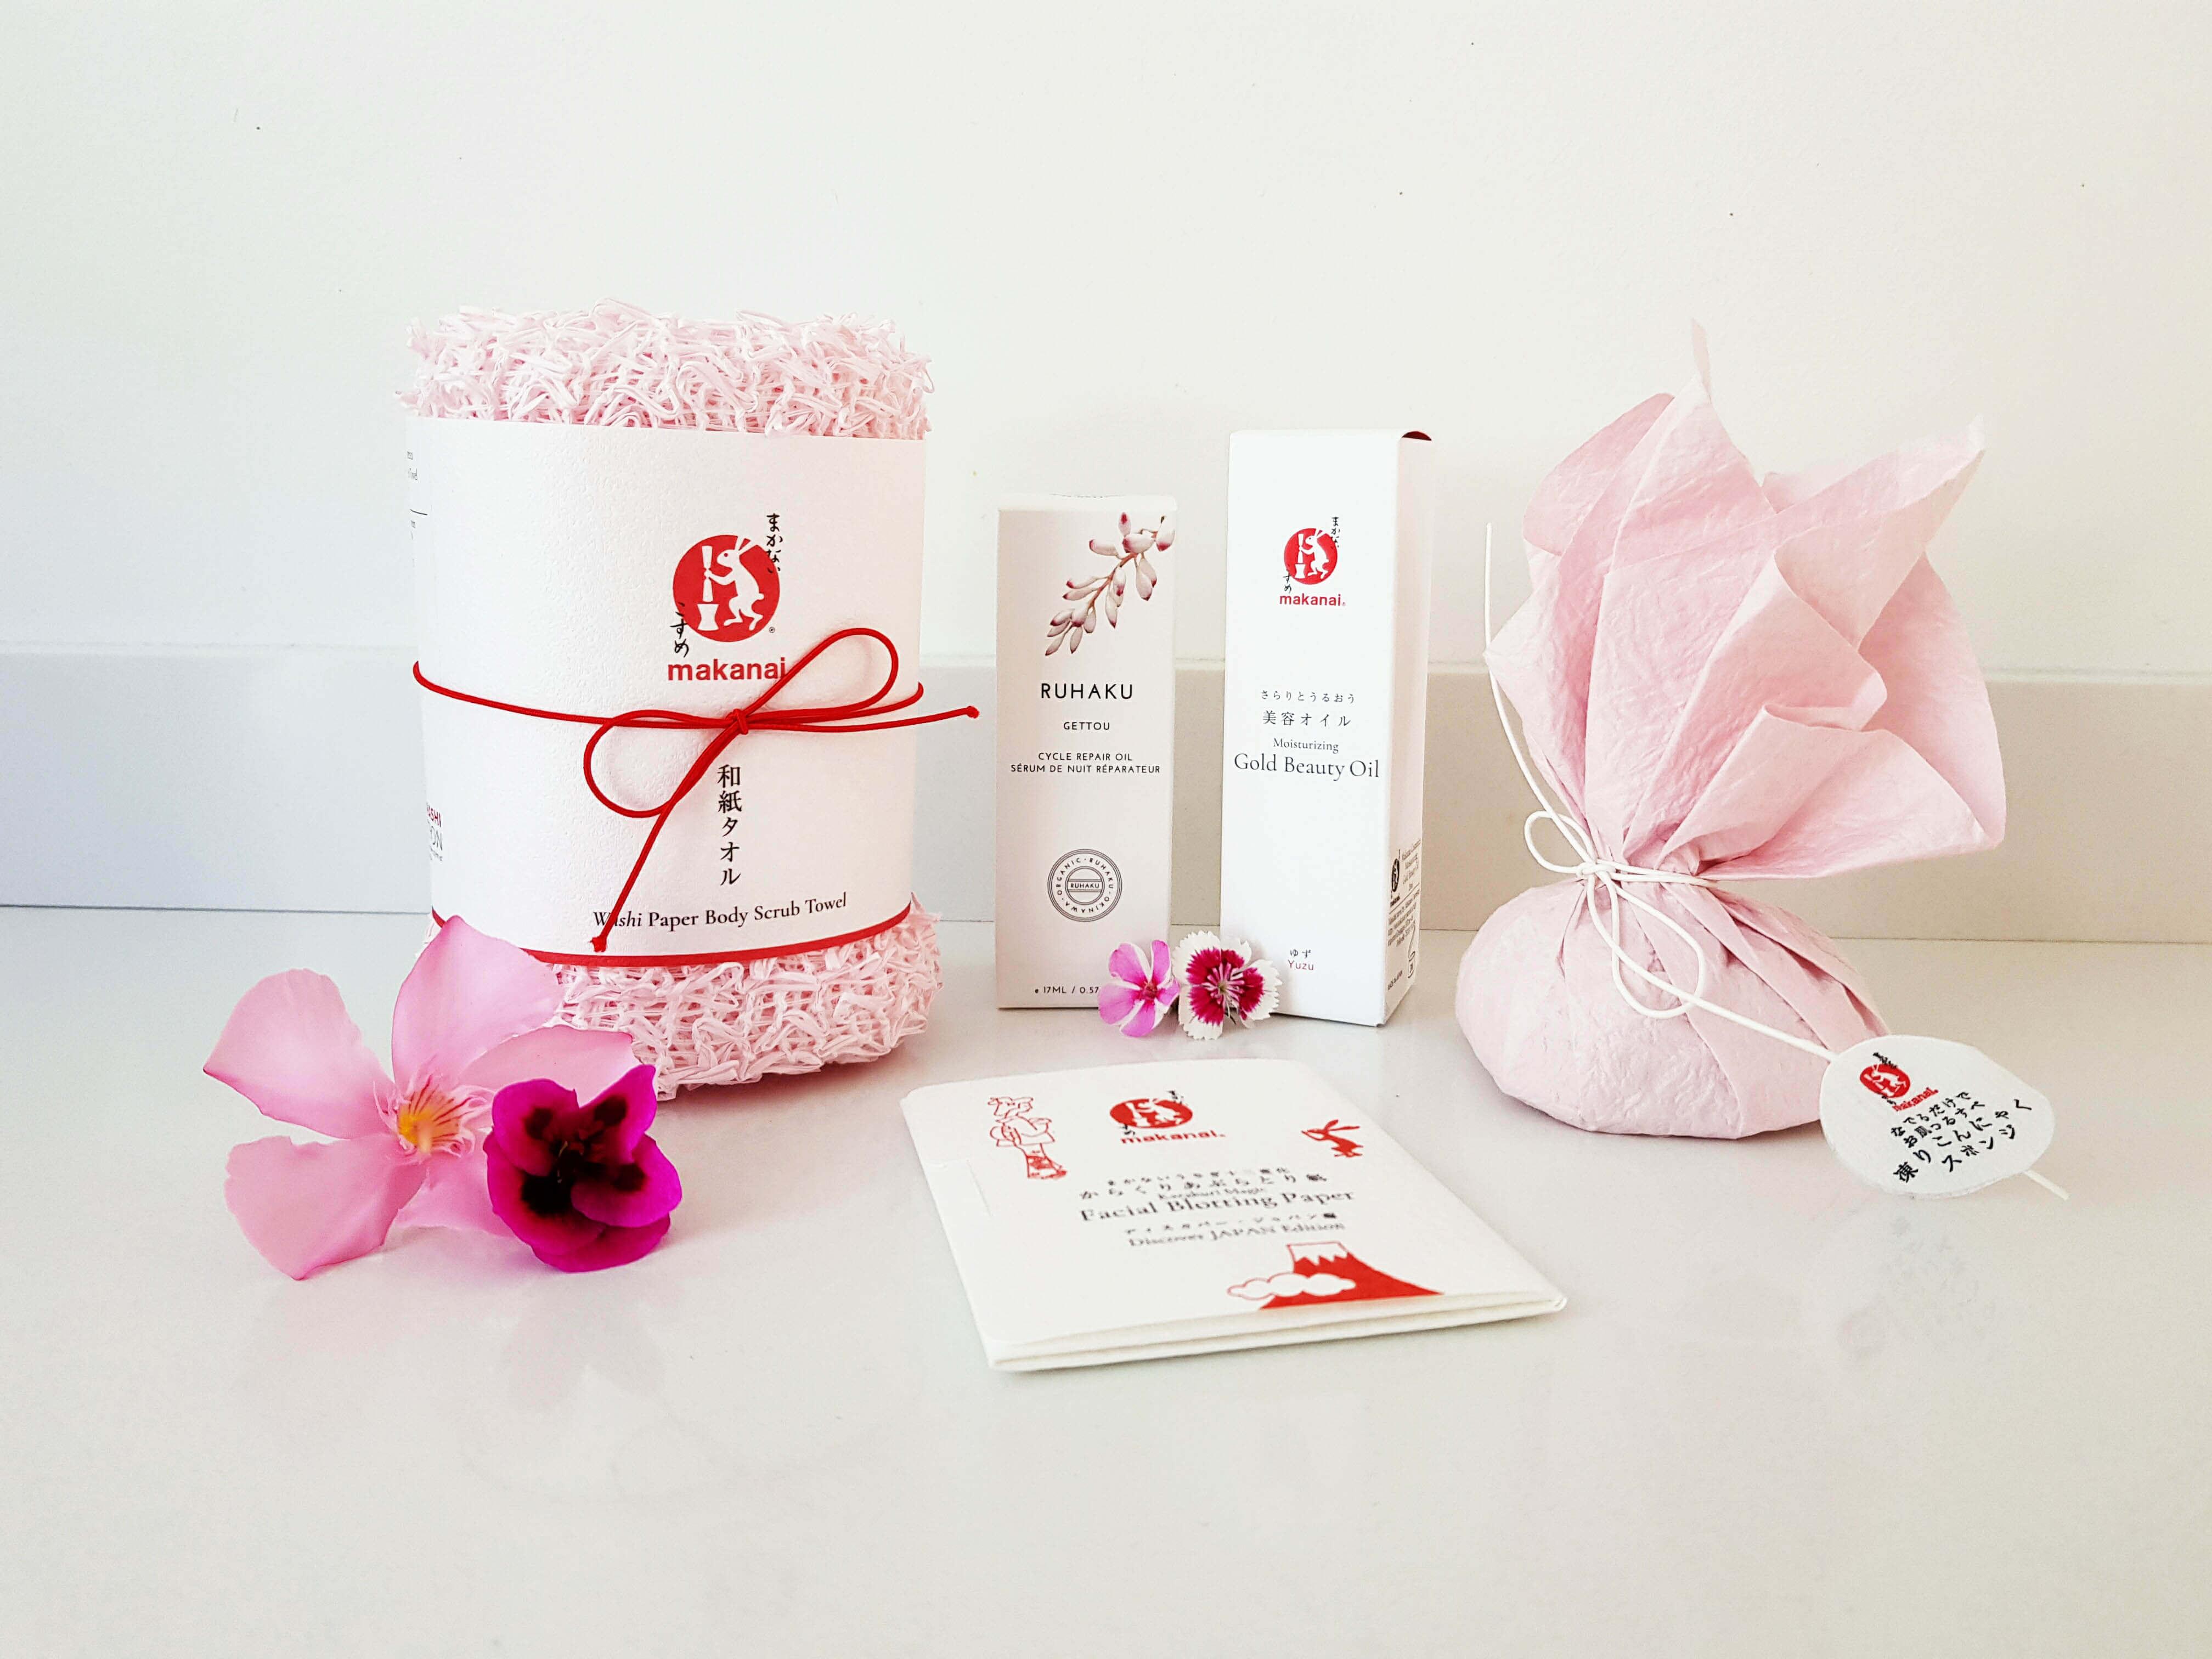 Japanse huidverzorging producten